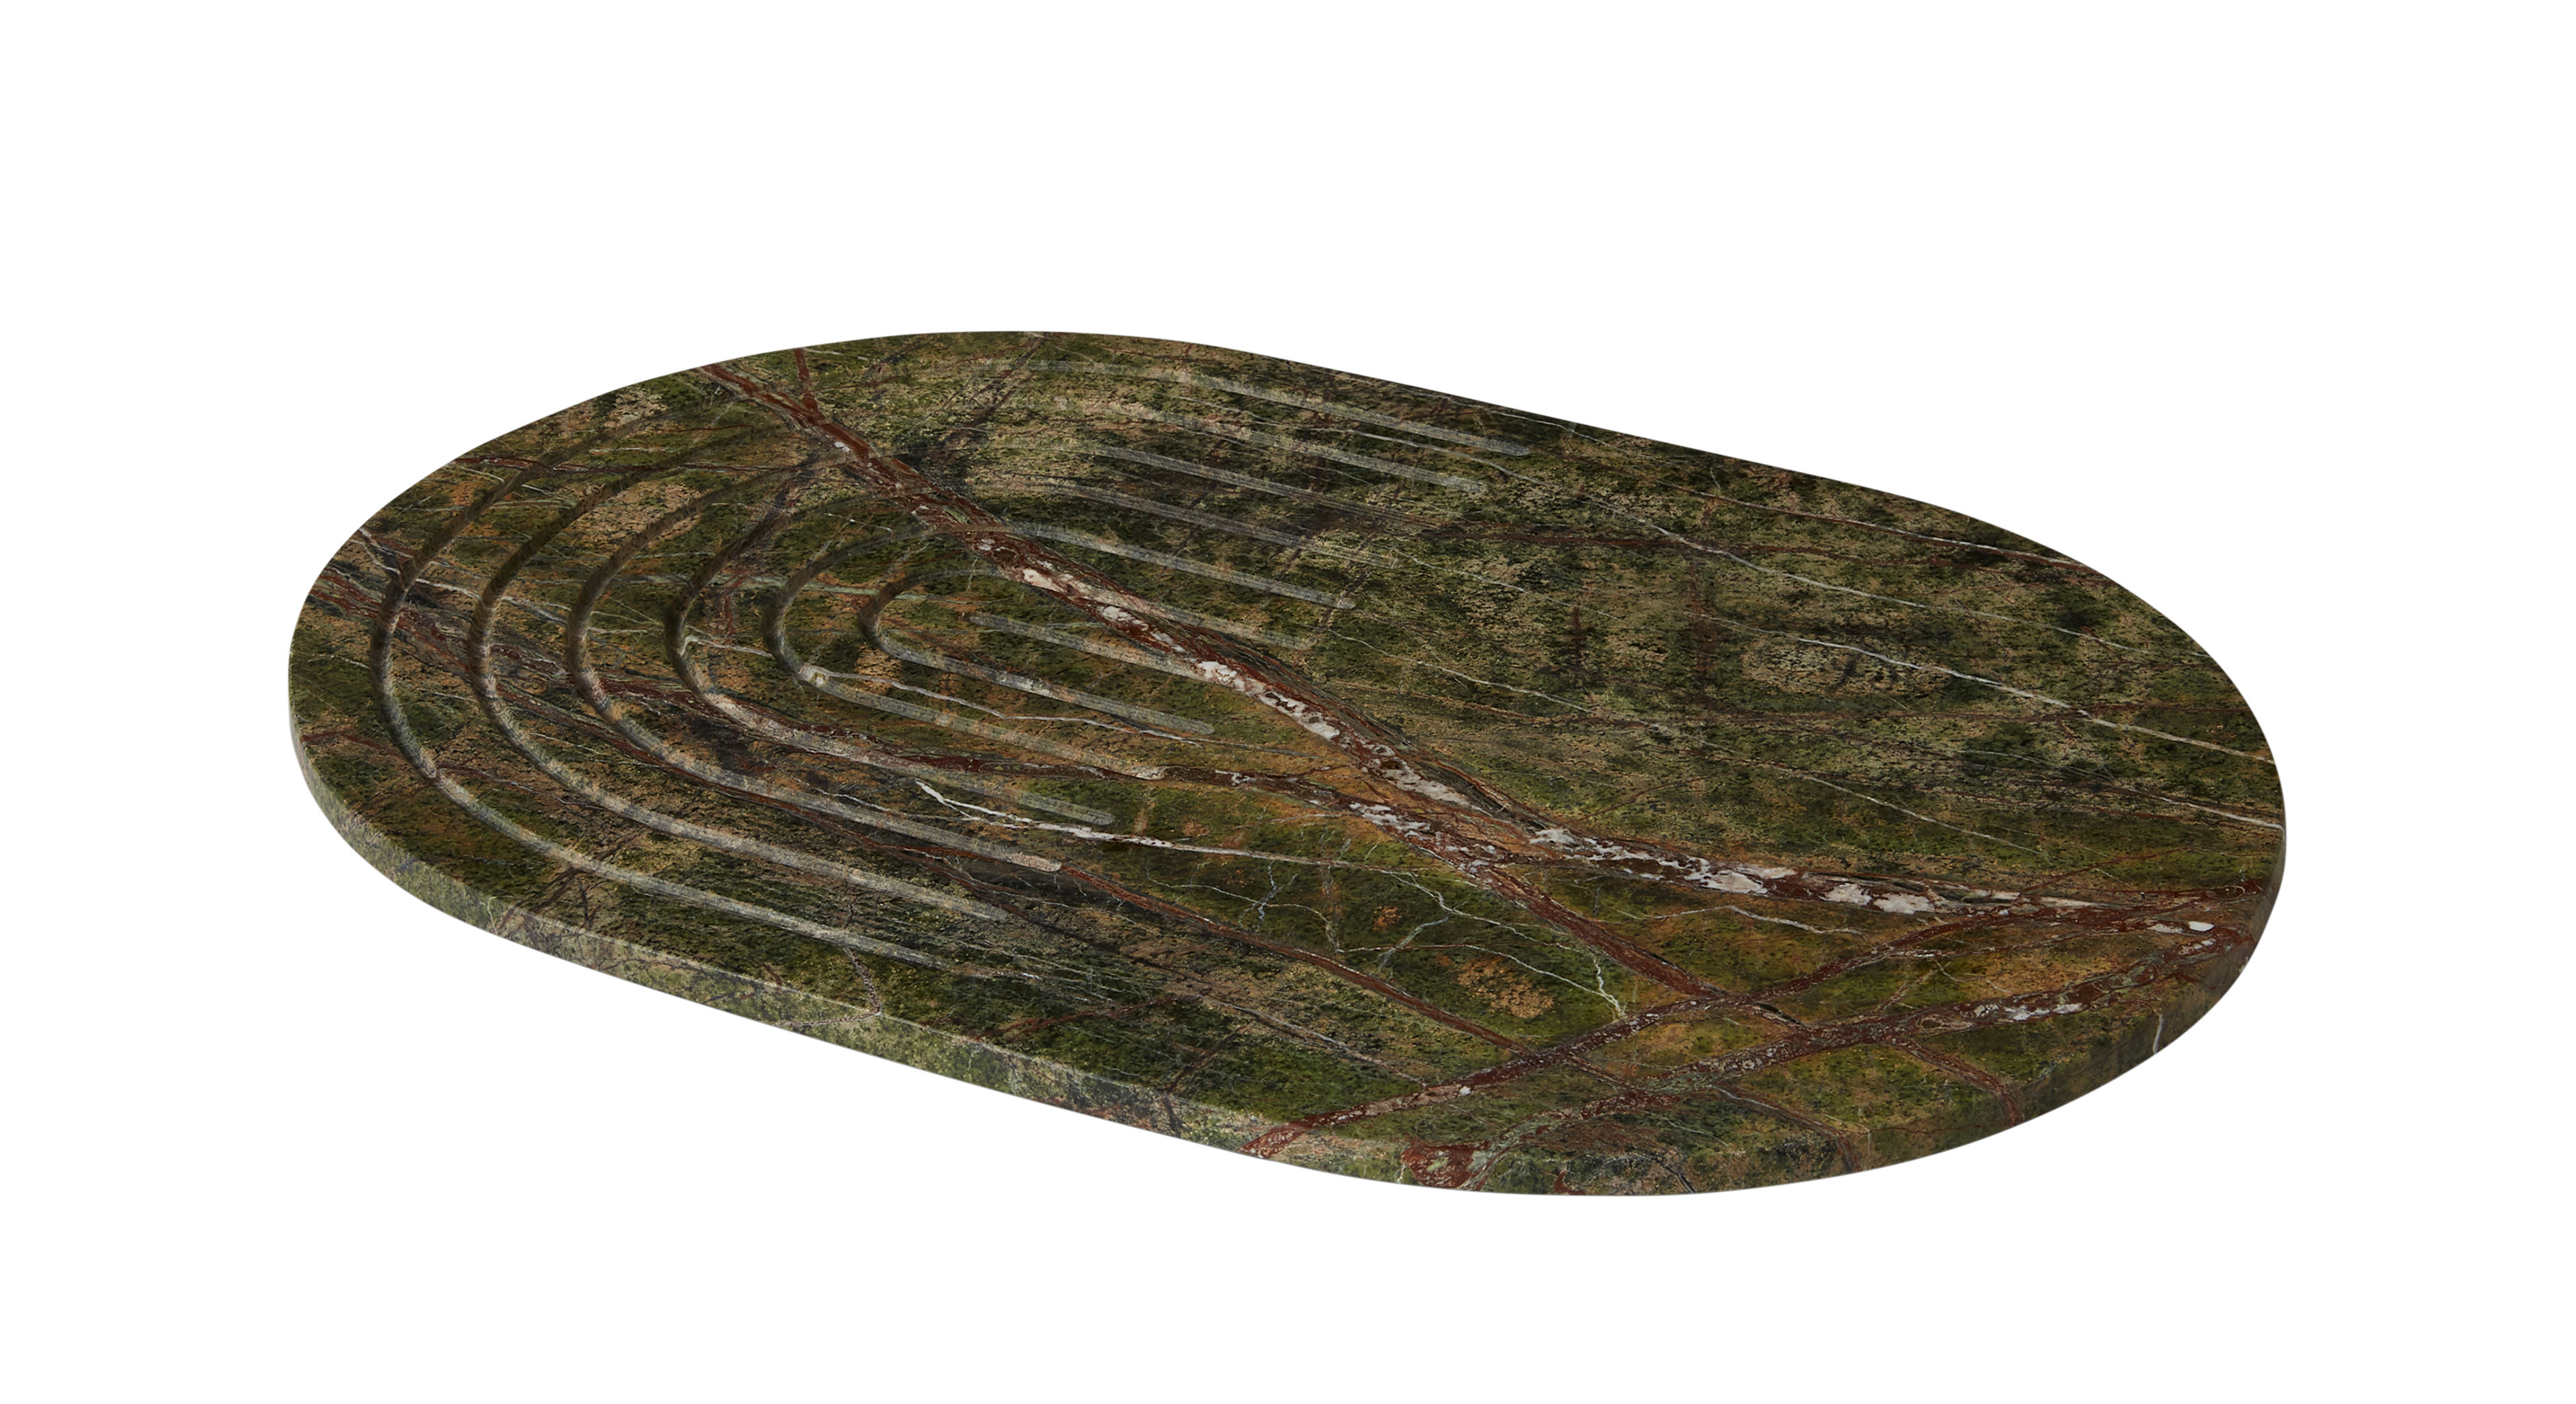 Tavola - Vassoi  - Piano/vassoio Rock Ovale - / Marmo - 42 x 28 cm di Tom Dixon - Ovale / Verde - Marmo